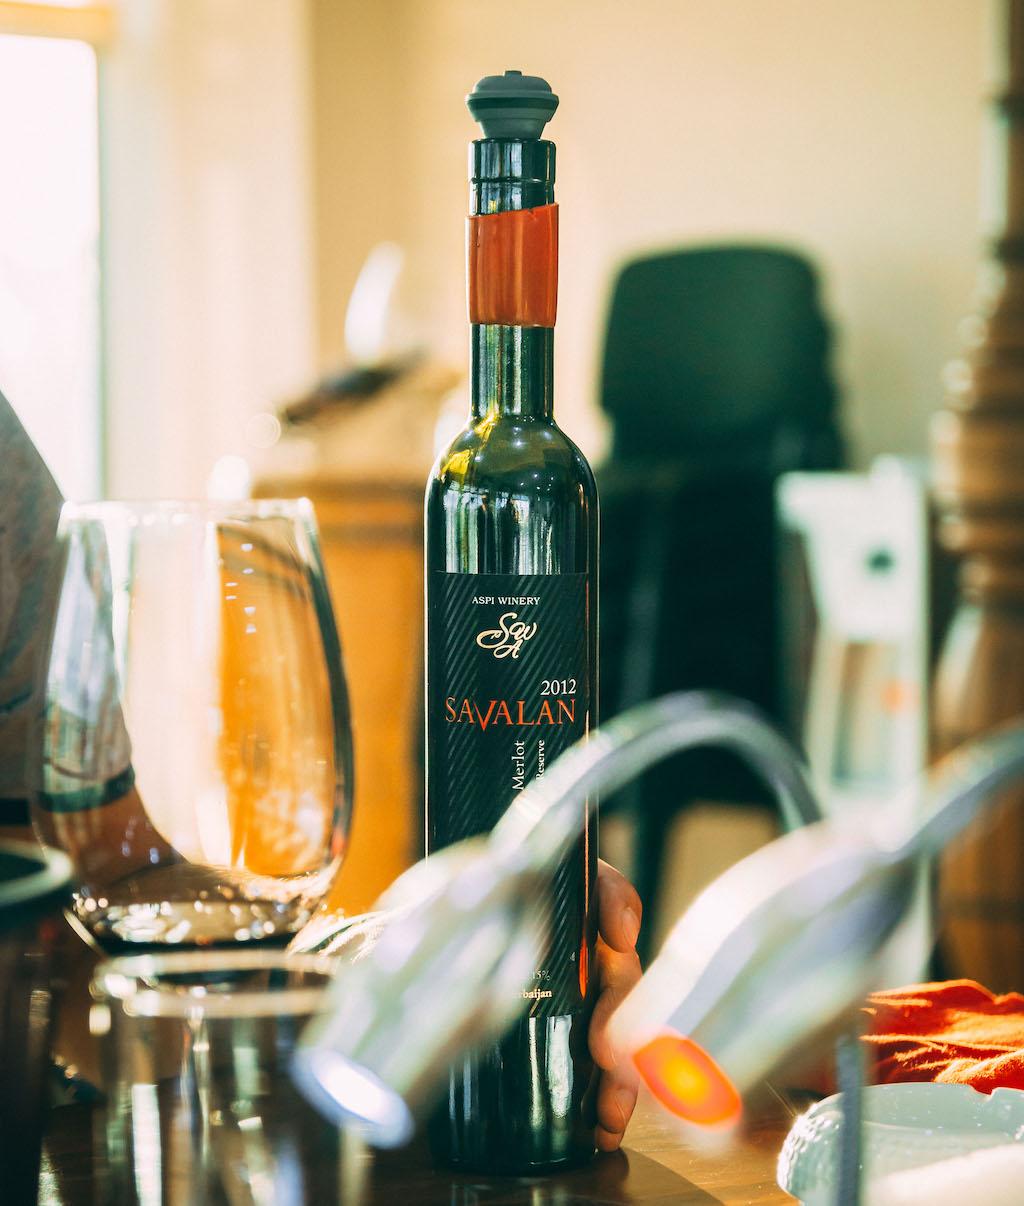 savalan-winery-azerbaijan-gabala